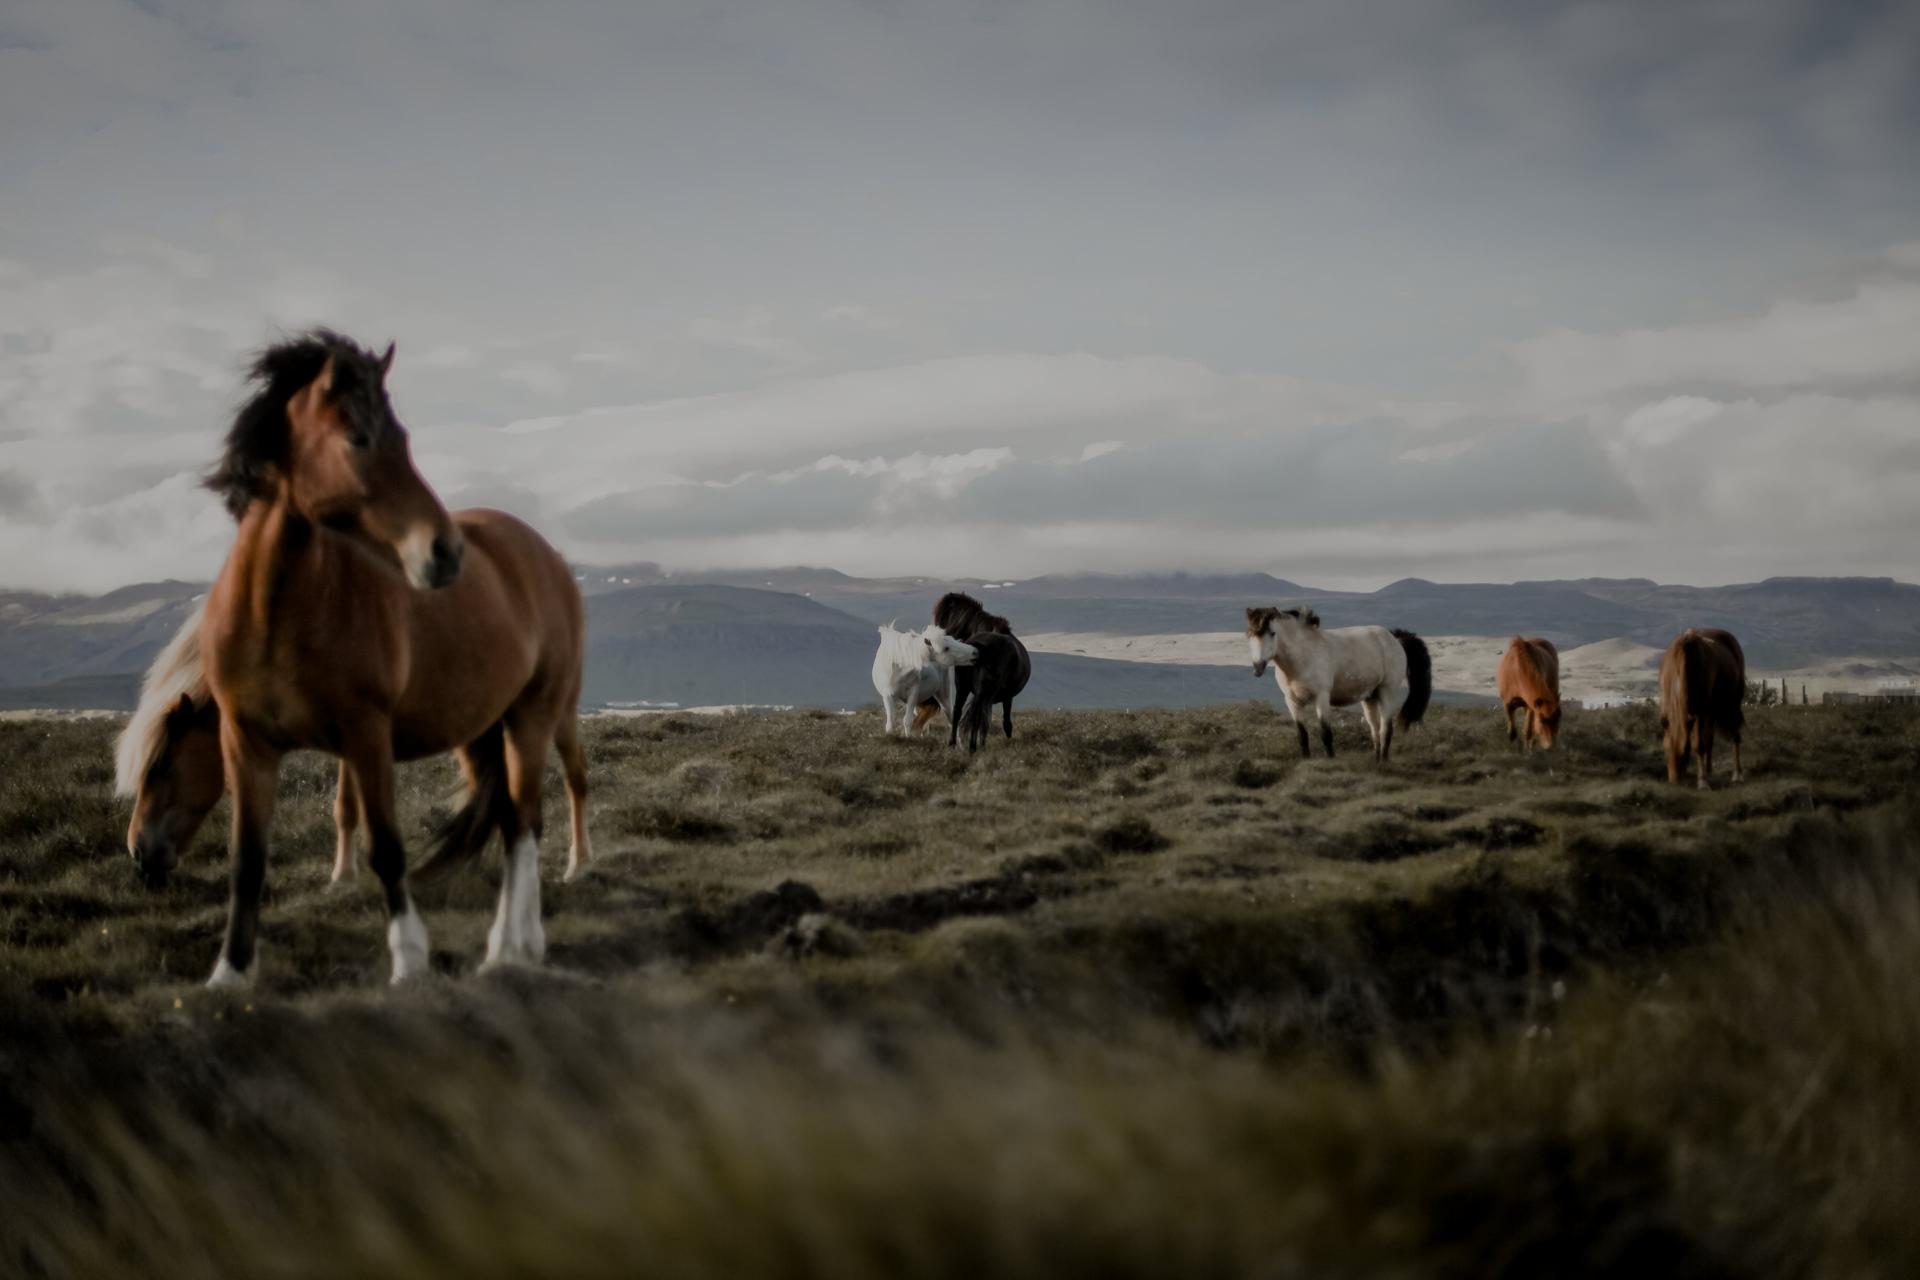 Atrakcje na Islandii - wulkany, baseny geotermalne i koniki